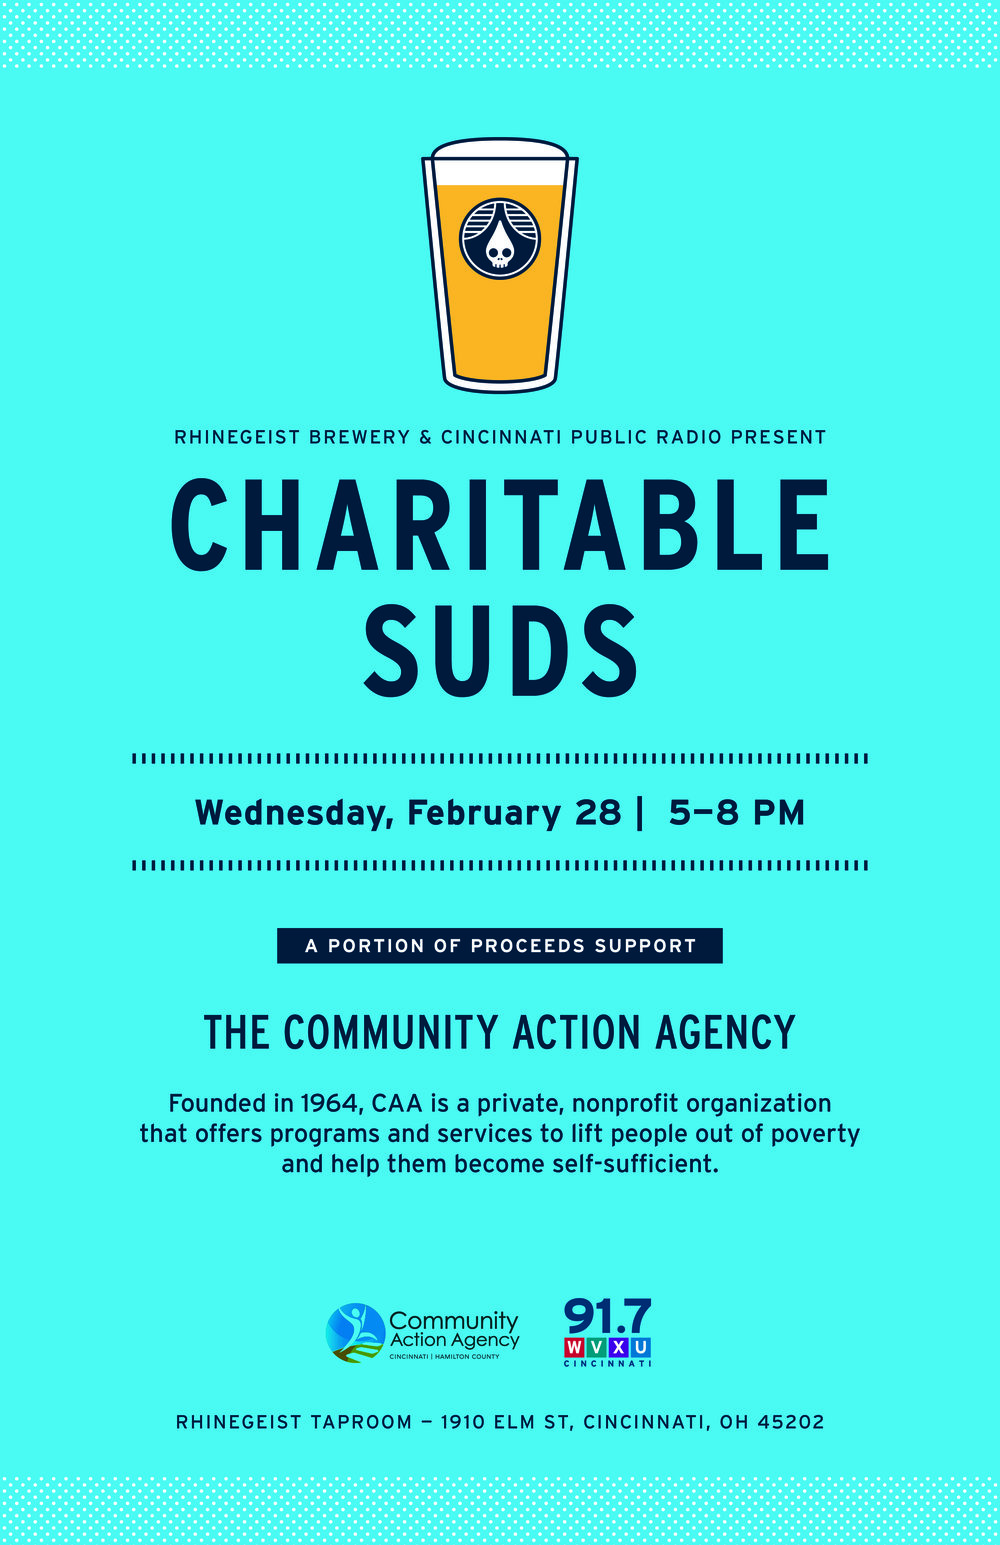 CharitableSuds_CommunityActionAgency_Poster-01.jpg